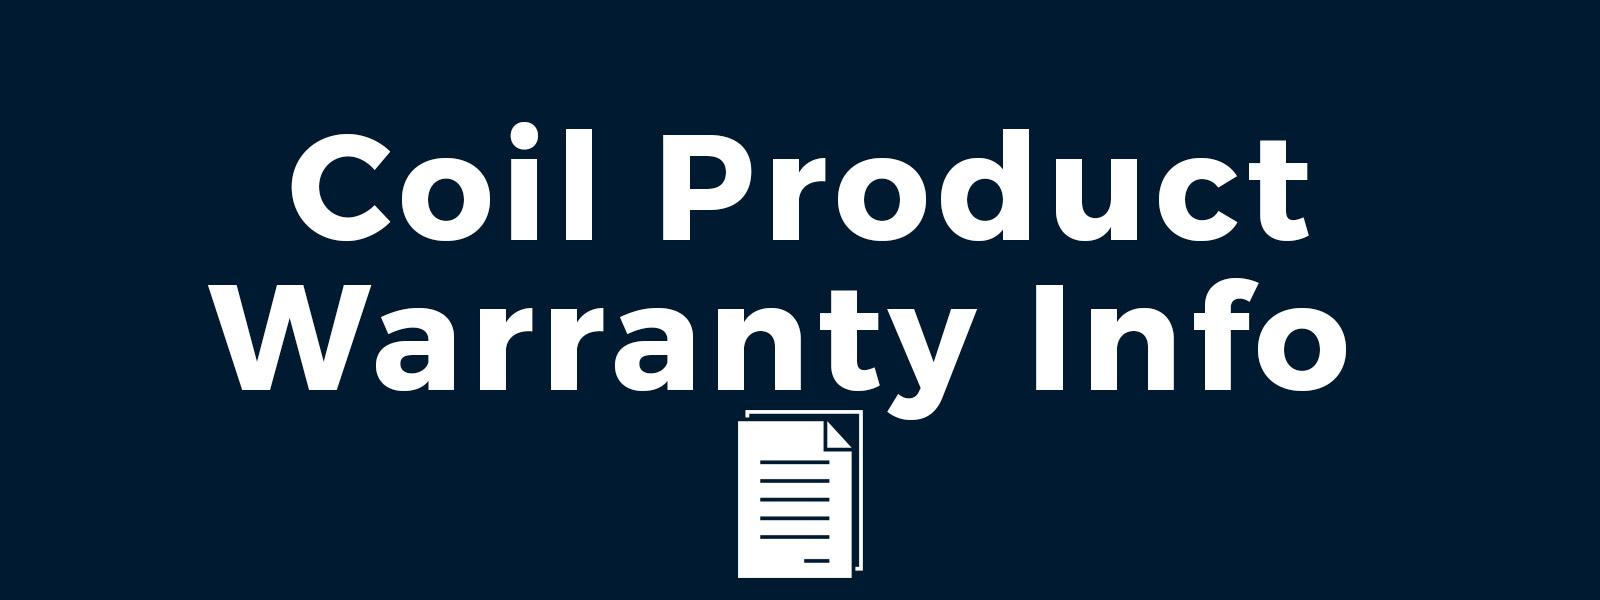 HVAC-Coil-Warranty-Info-Temtrol